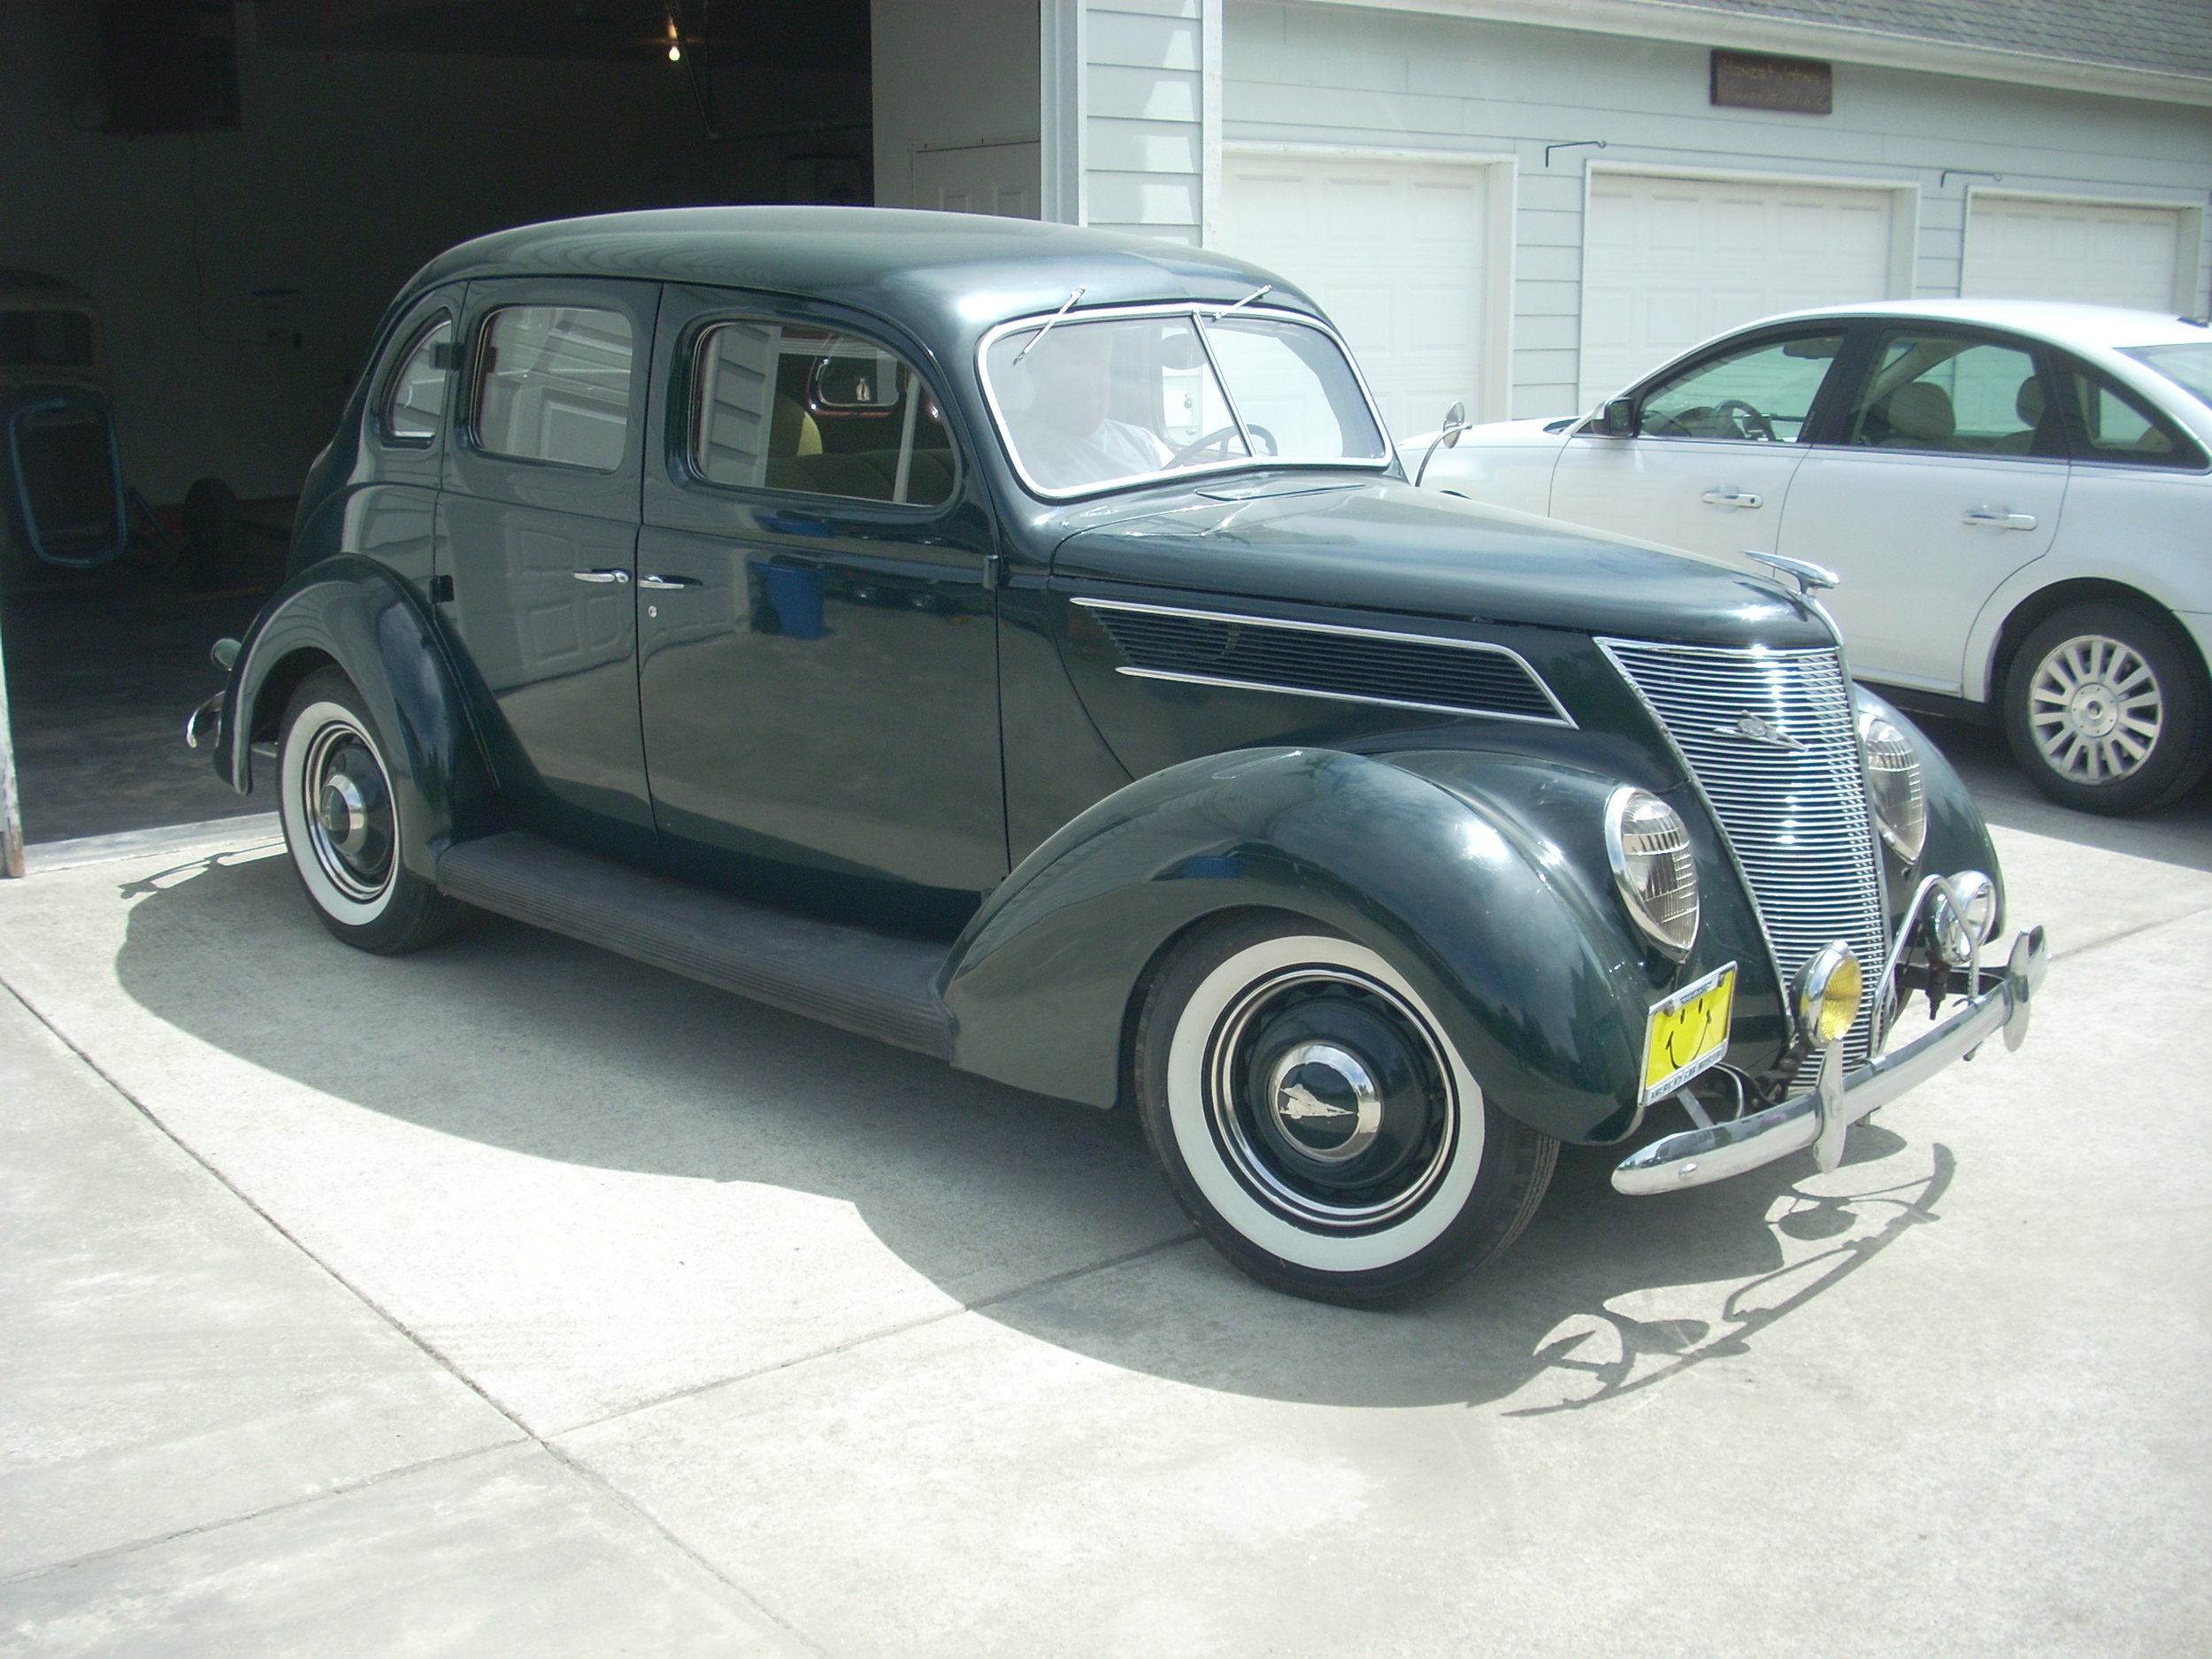 John And Nancy McGinnis - 1937 Ford 4-door Sedan